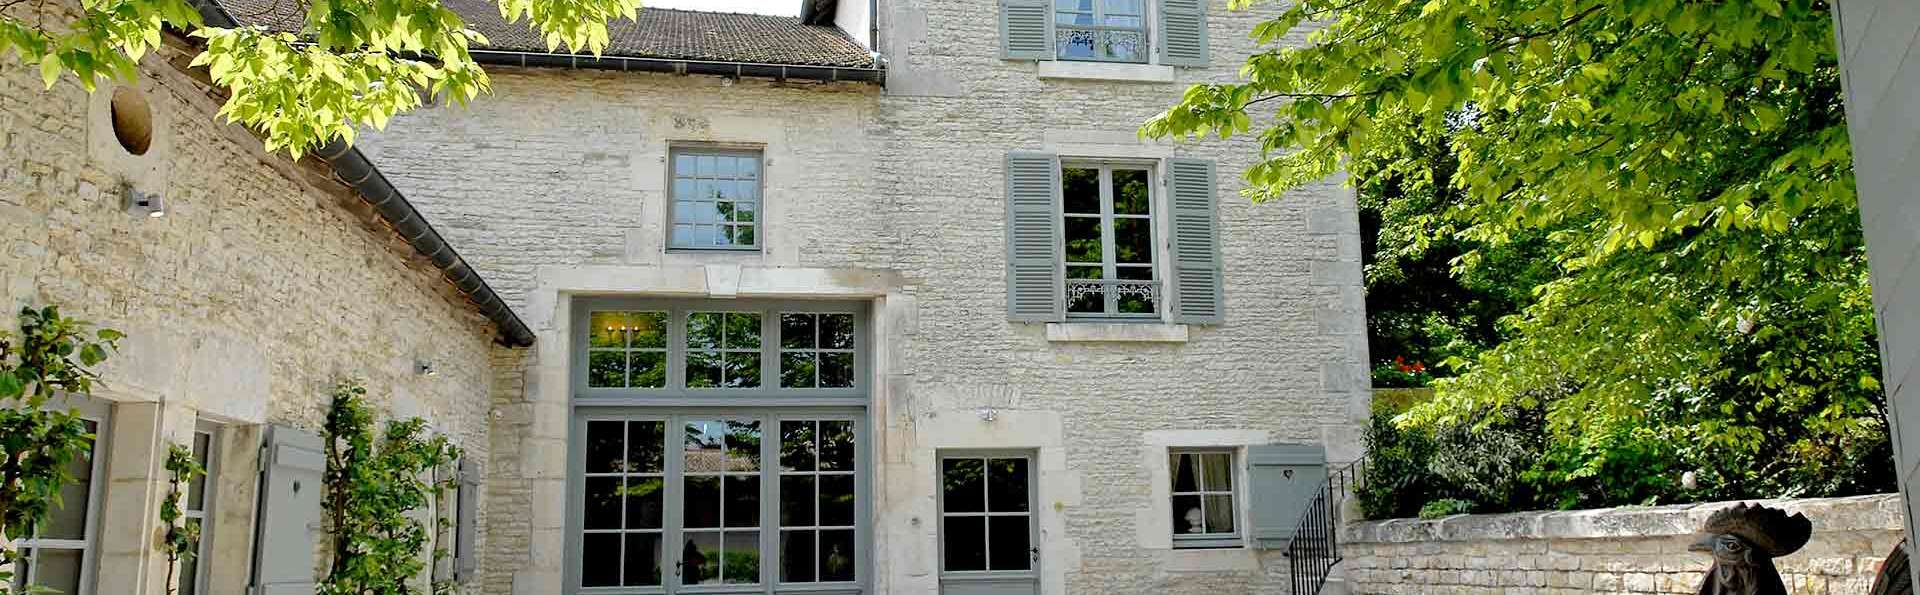 Hostellerie La Montagne - Edit_Front2.jpg